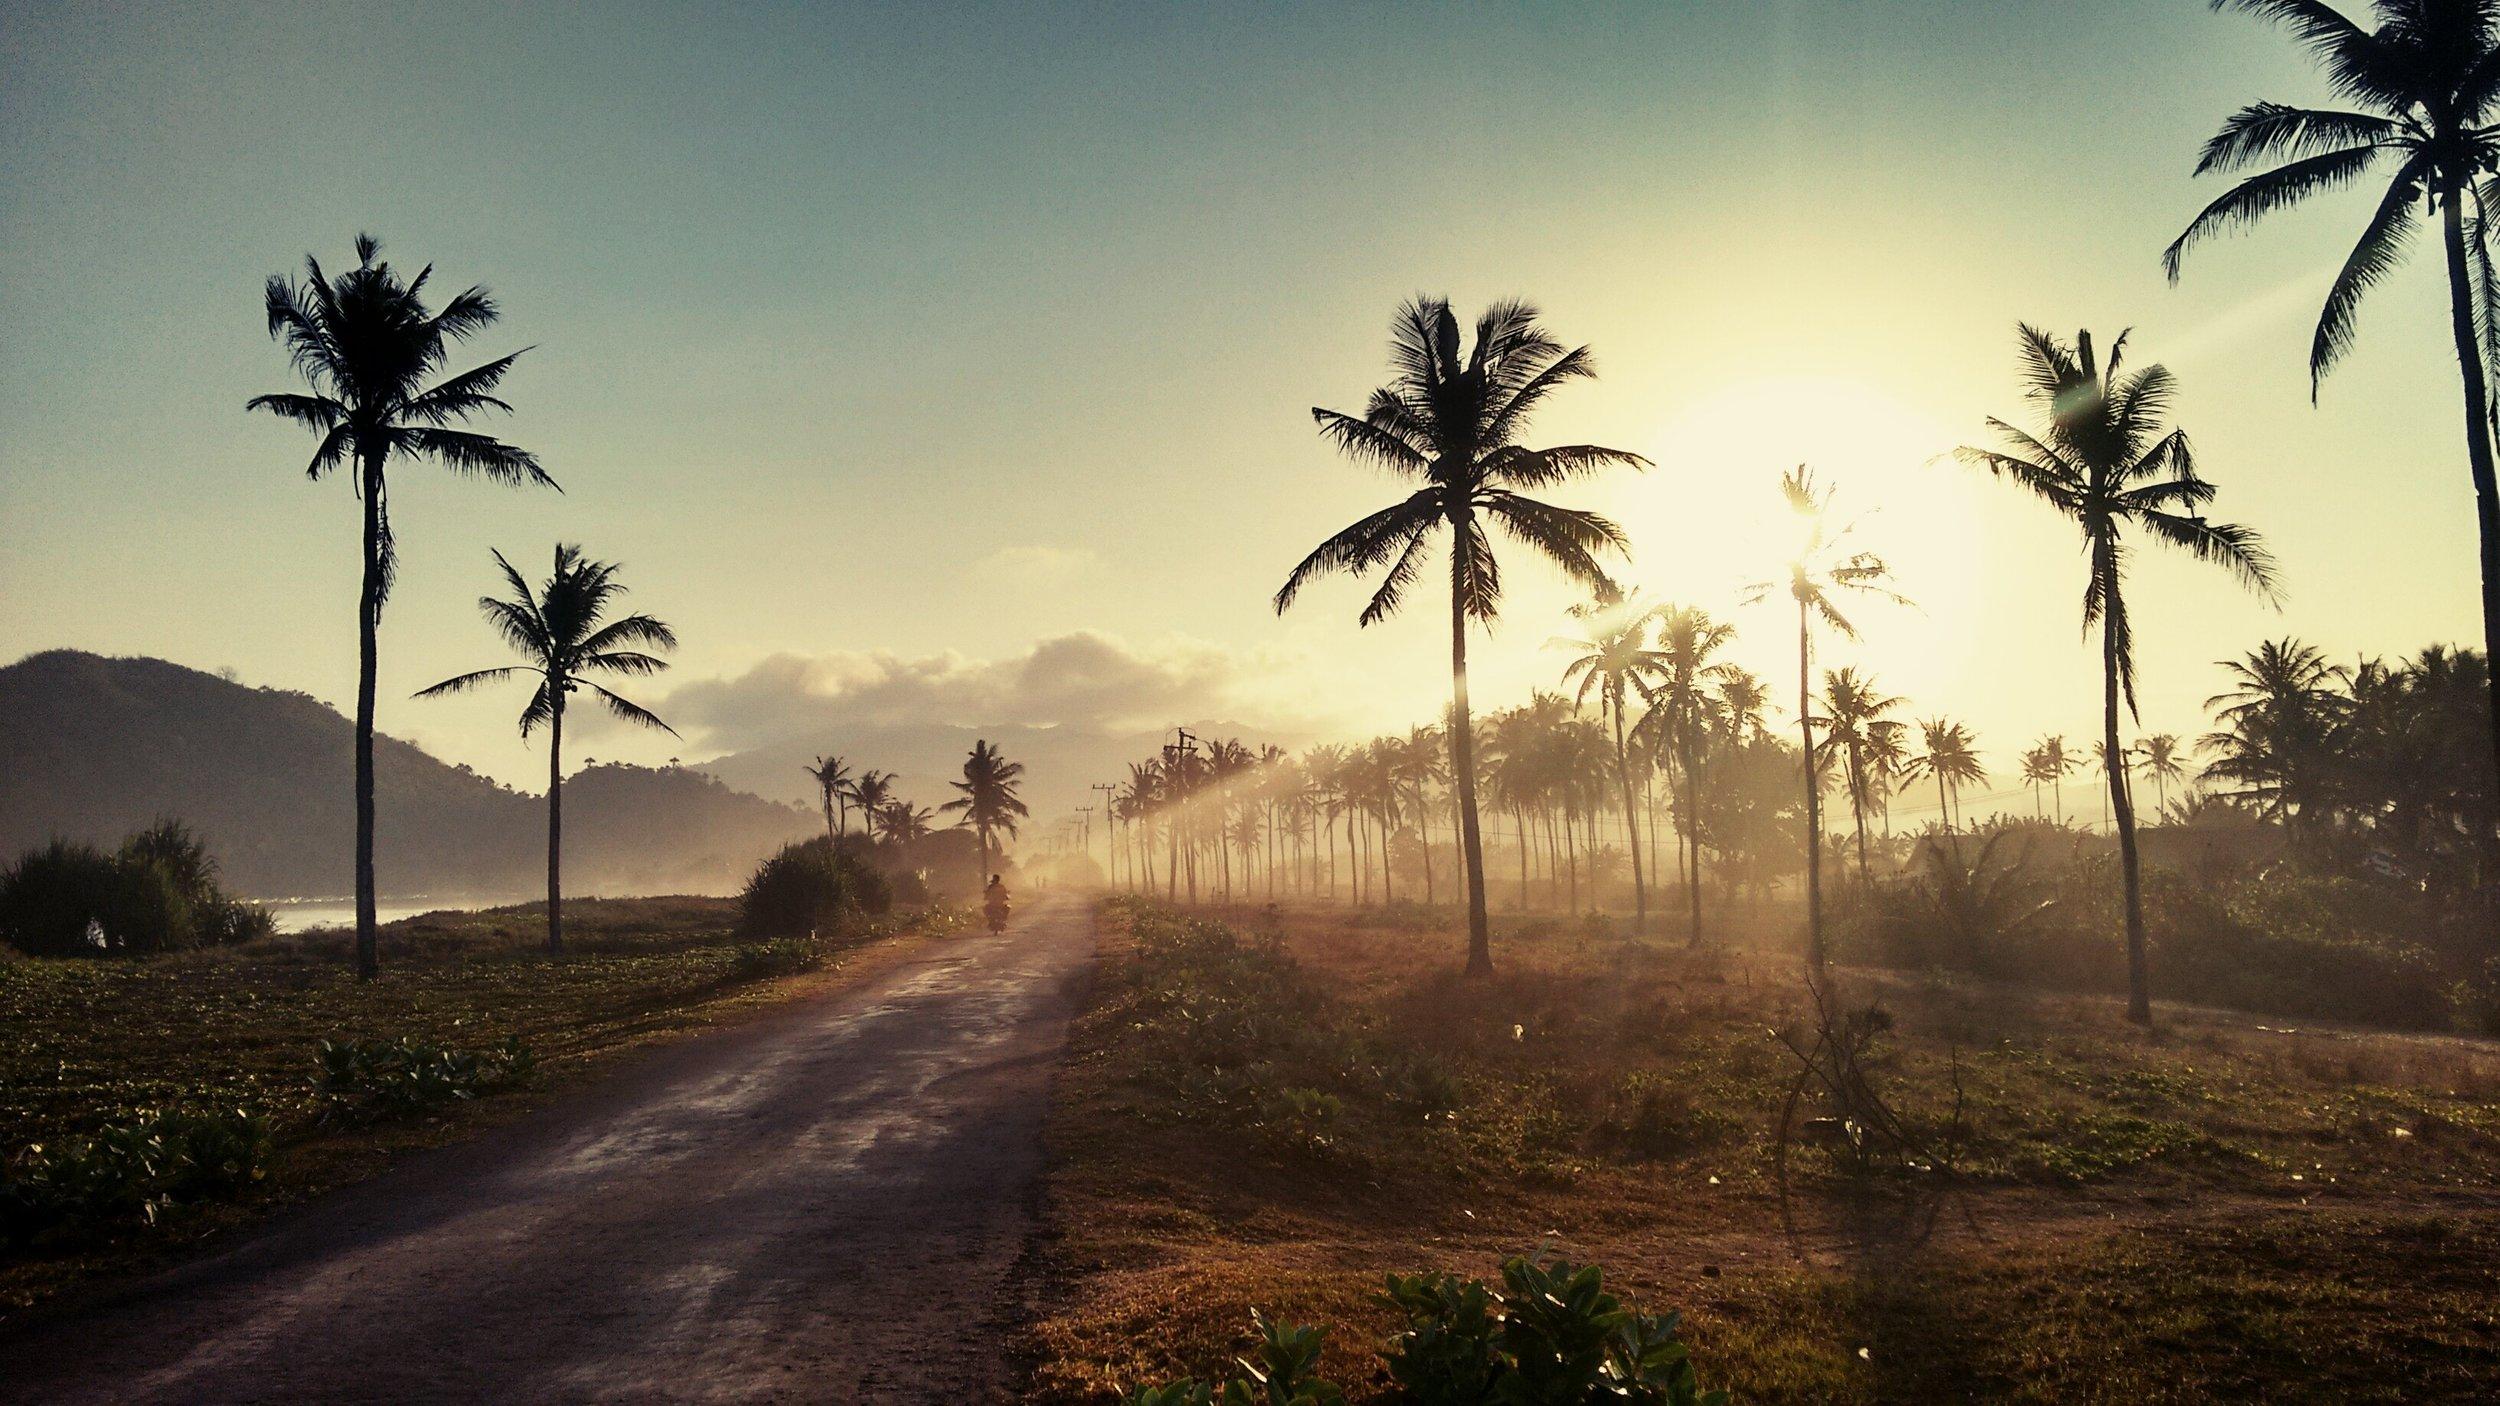 palm tree plantation.jpg